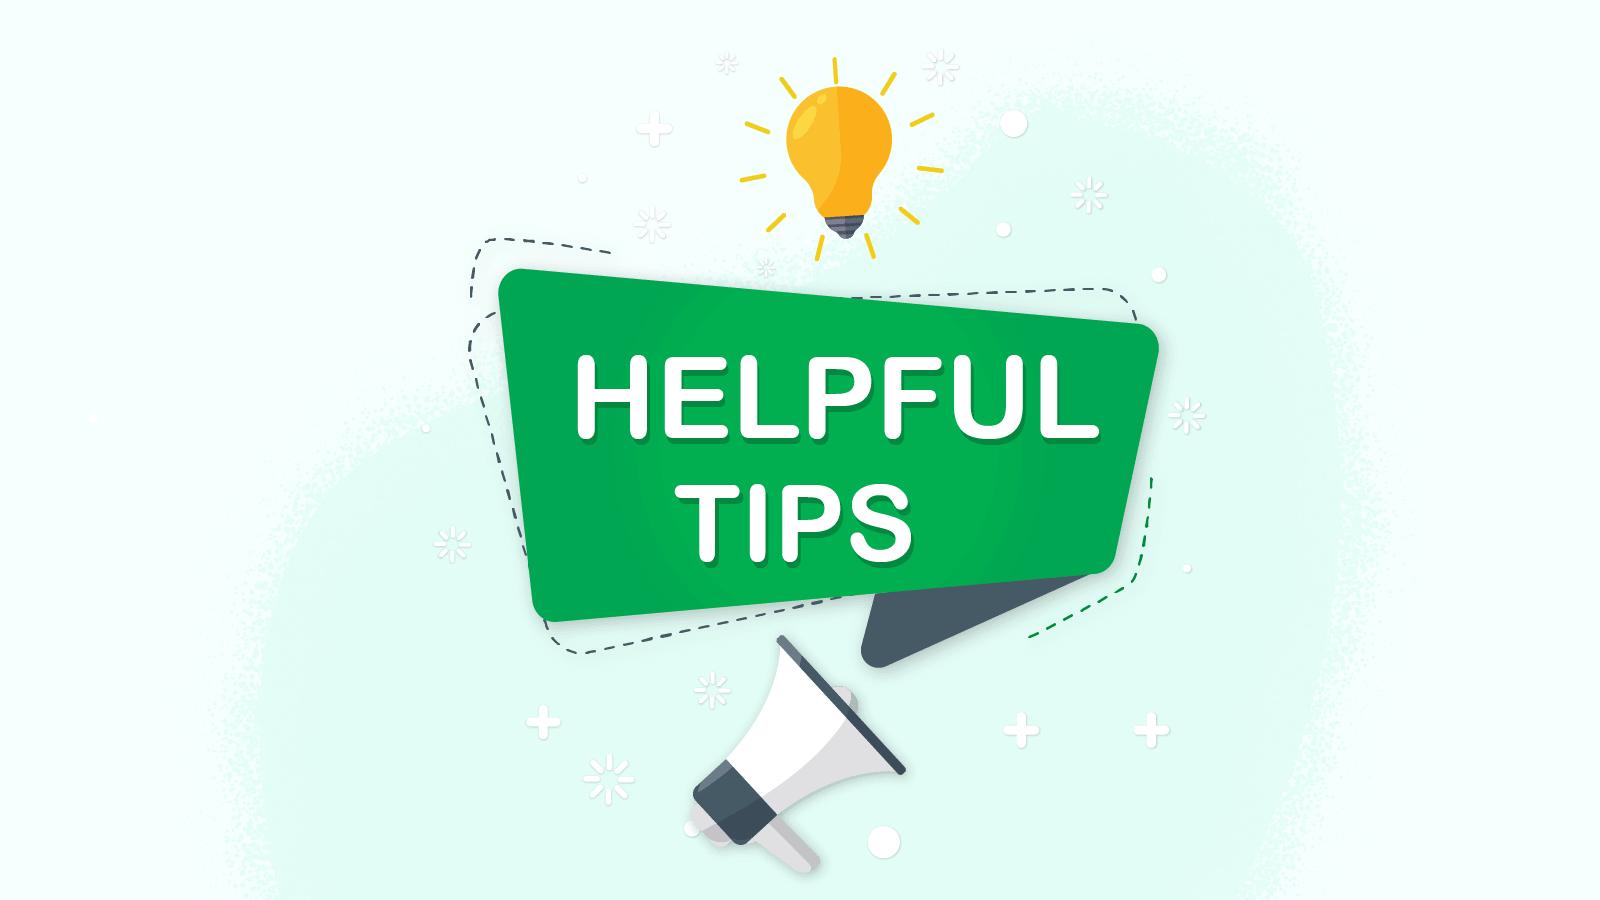 Tips from CasinoAlpha experts